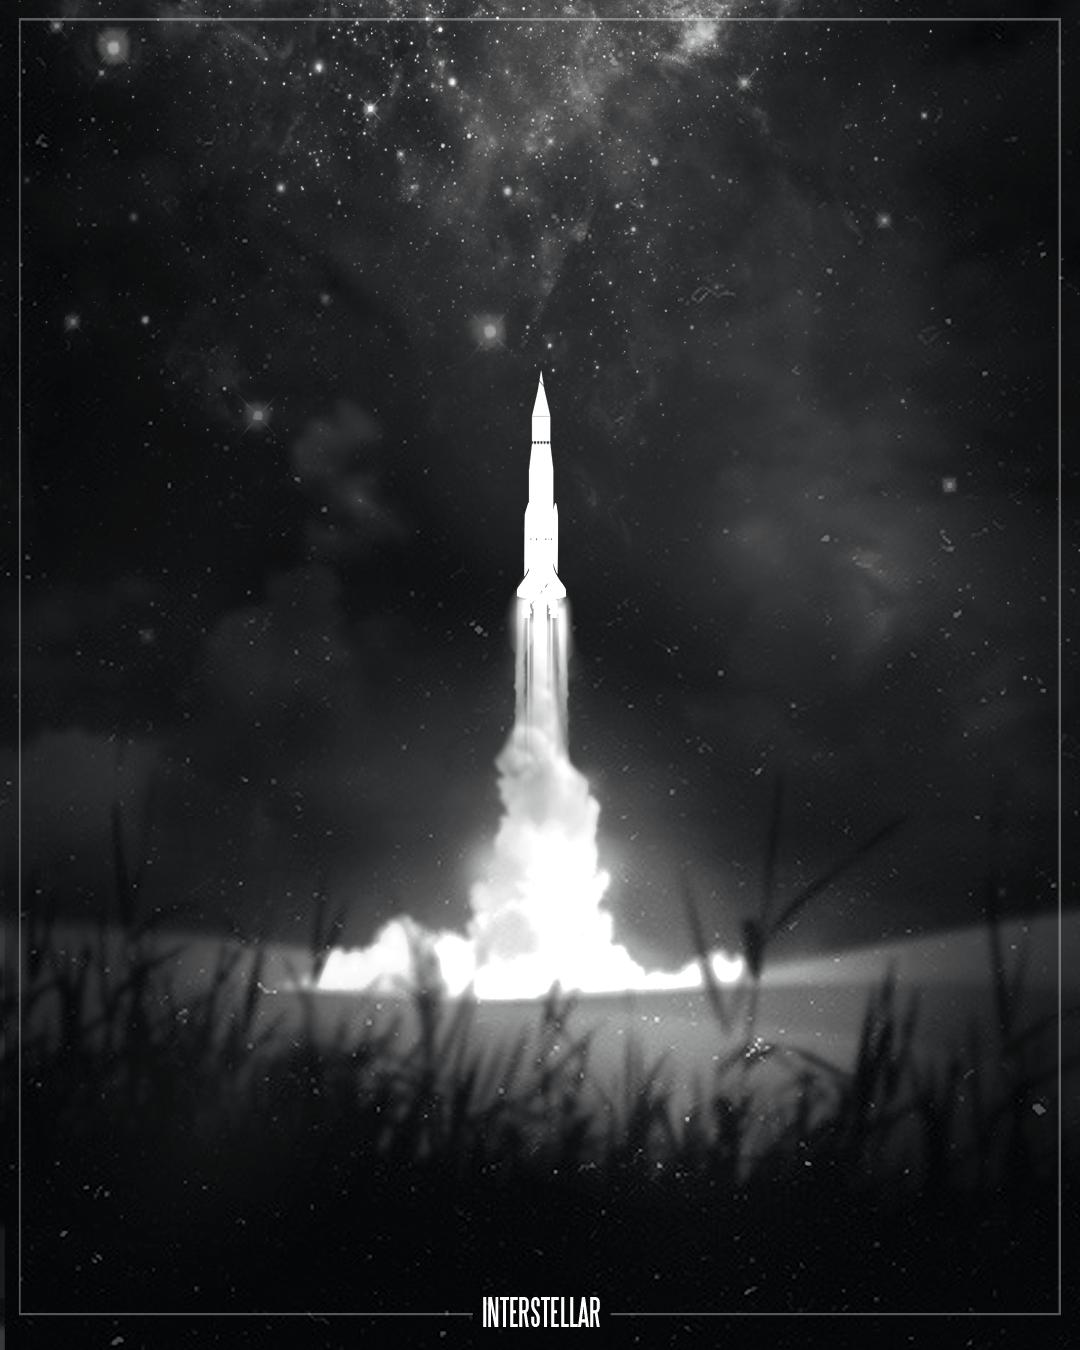 Film Noir Style Design Of Movie Posters Interstellar - Beautifully designed interstellar posters james fletcher